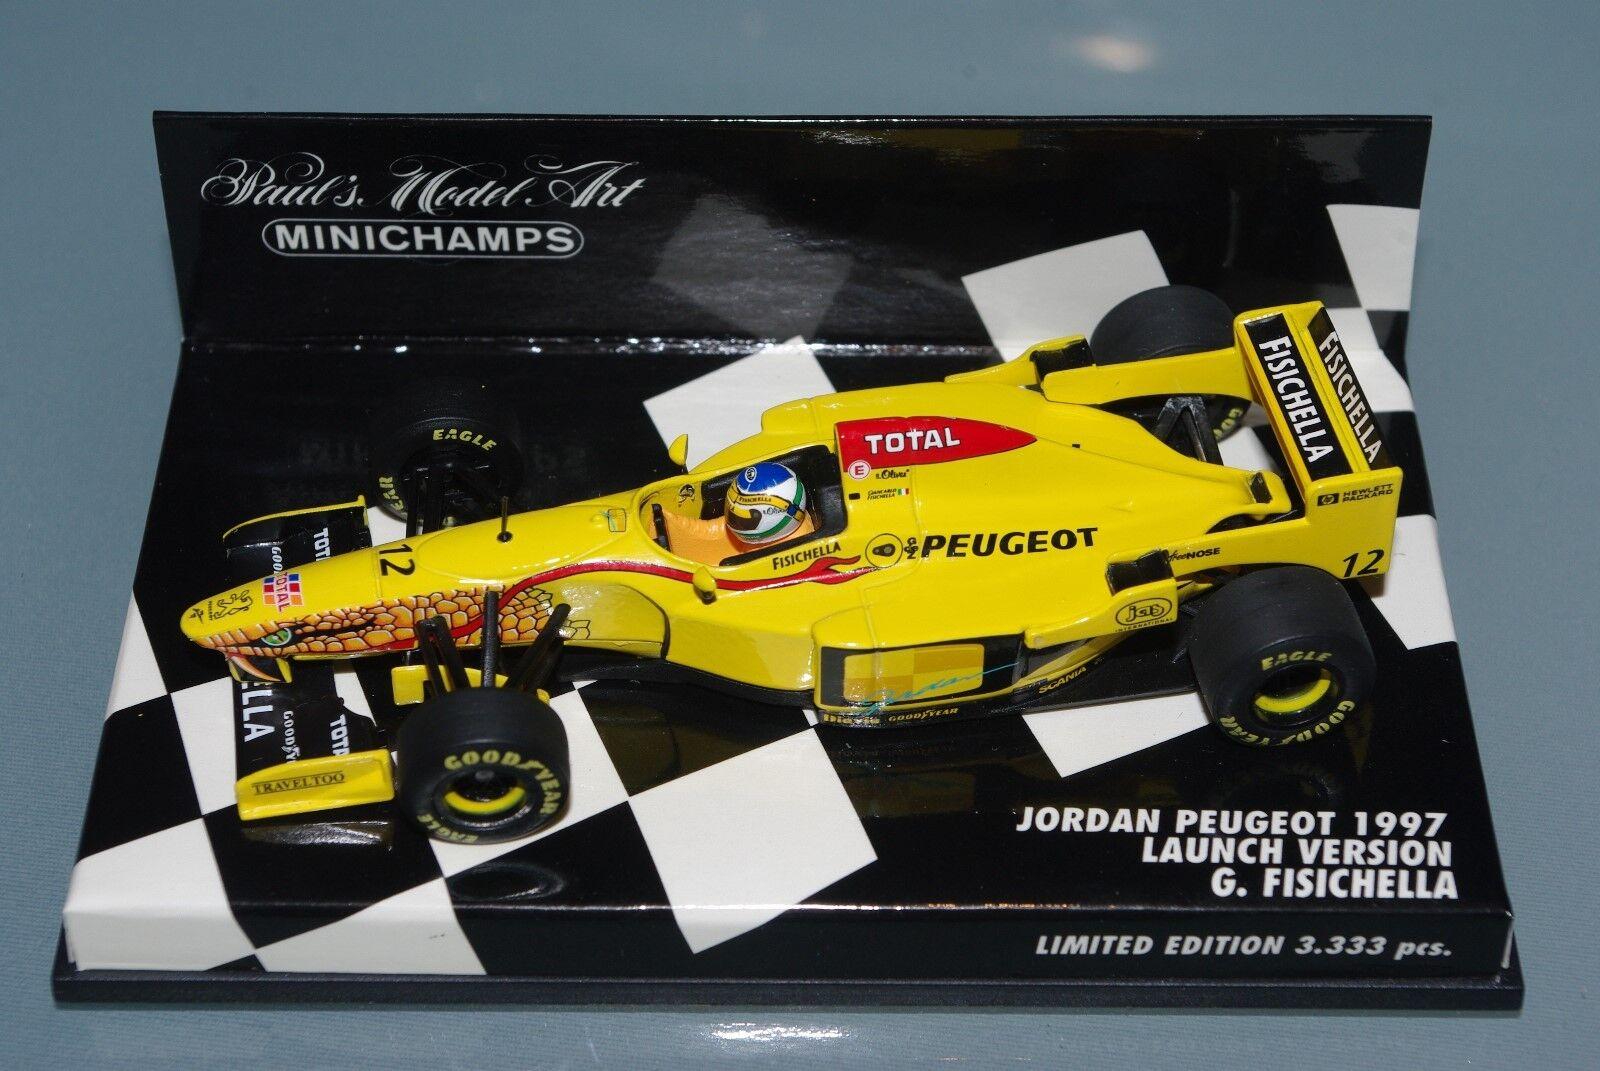 Minichamps F1 1 43 JORDAN PEUGEOT 1997 Launch Version-Giancarlo Fisichella